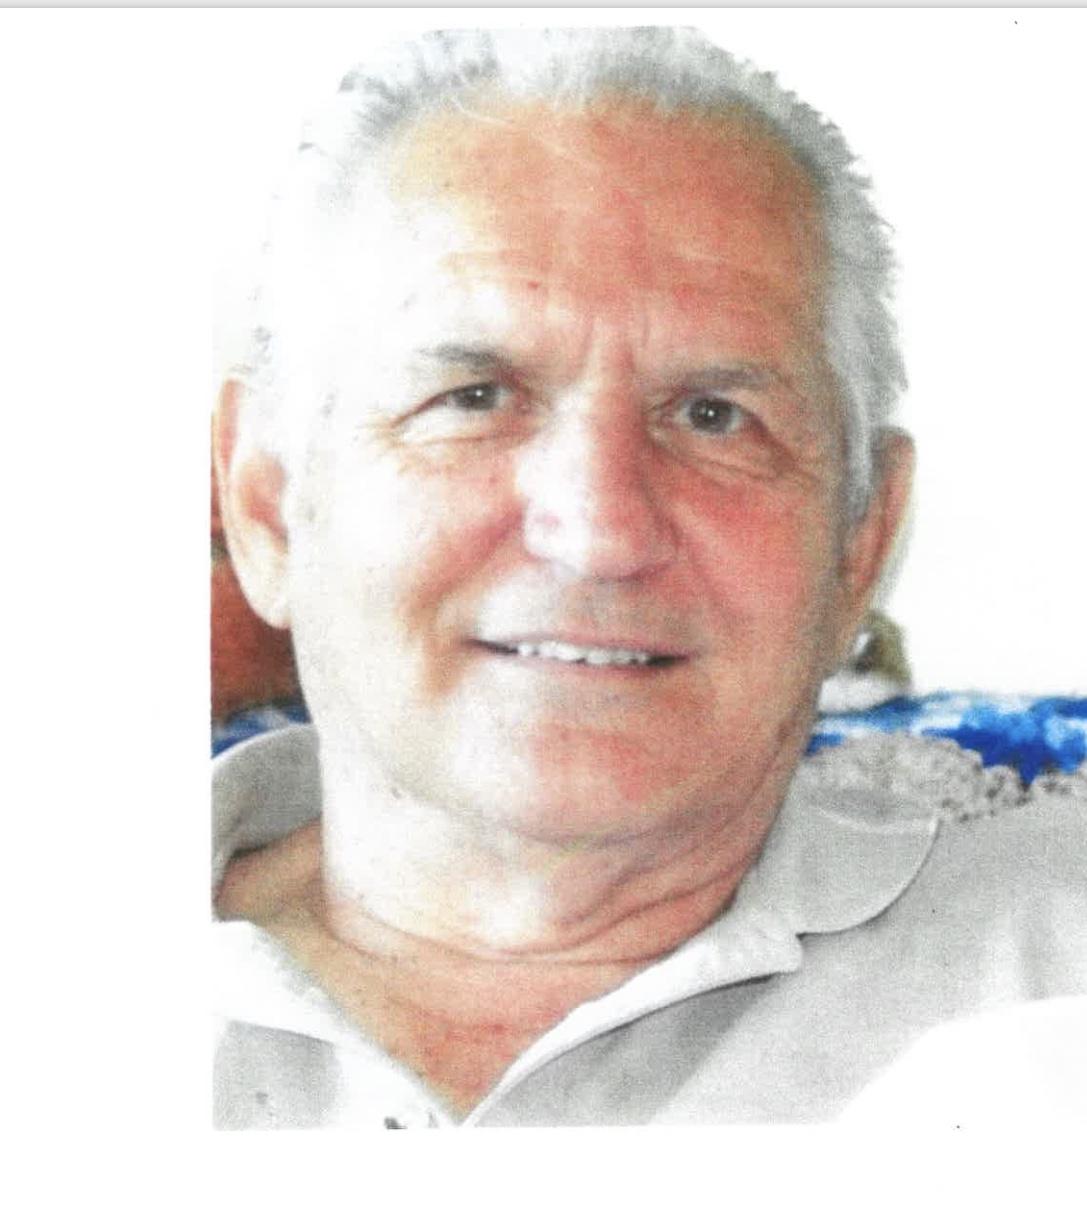 FOUND-Surrey RCMP need help locating 83 year old Mr Schultz